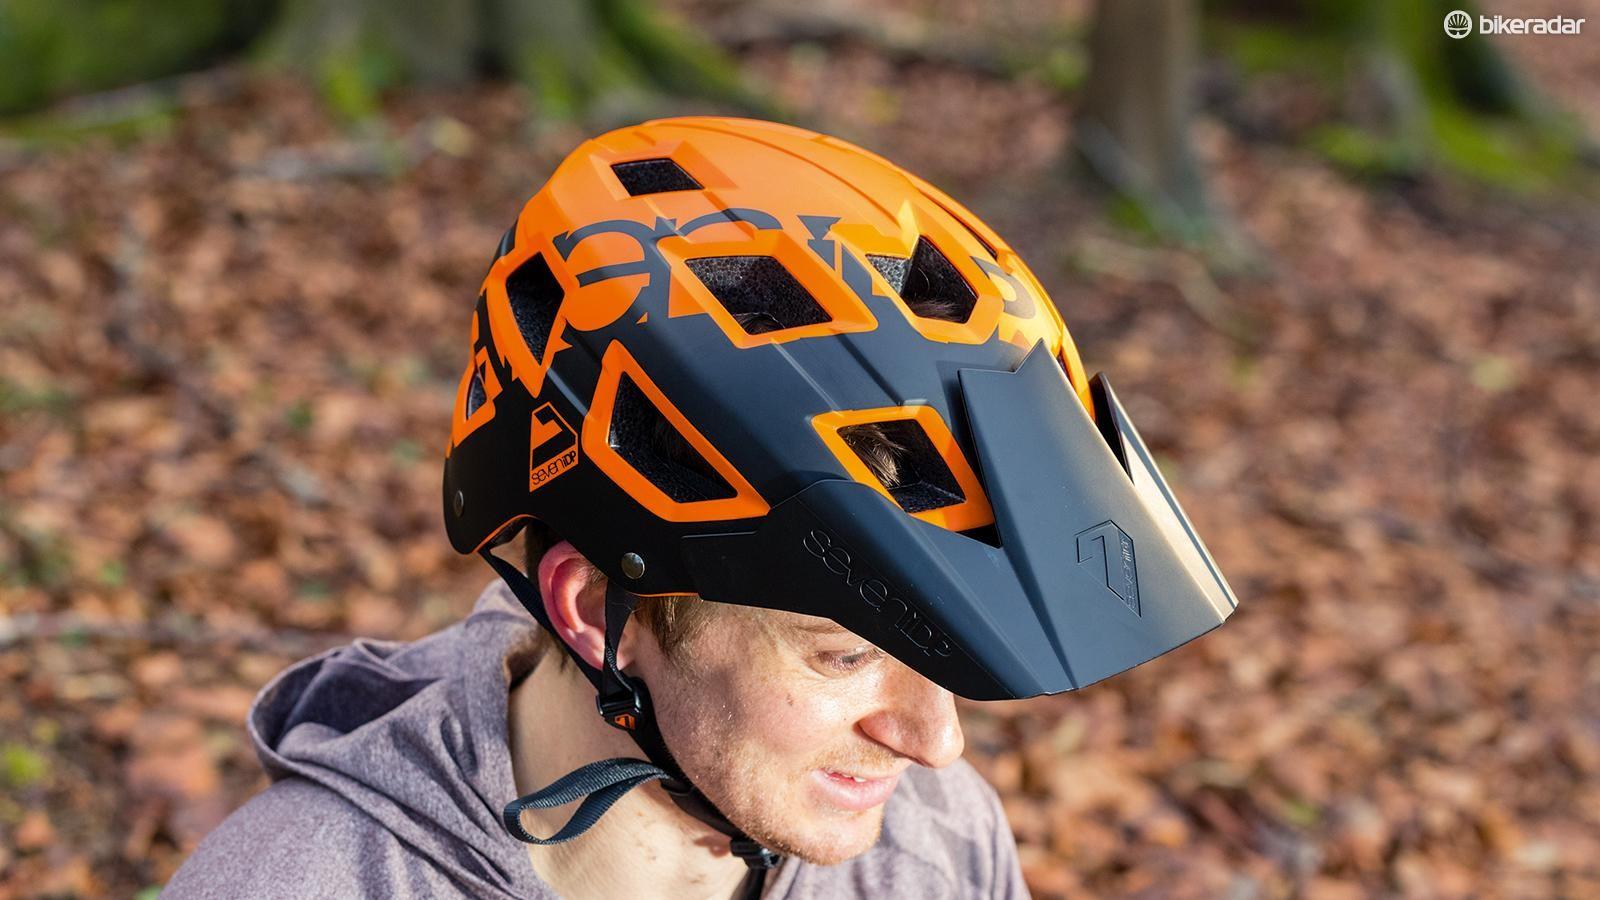 7iDP's M5 helmet